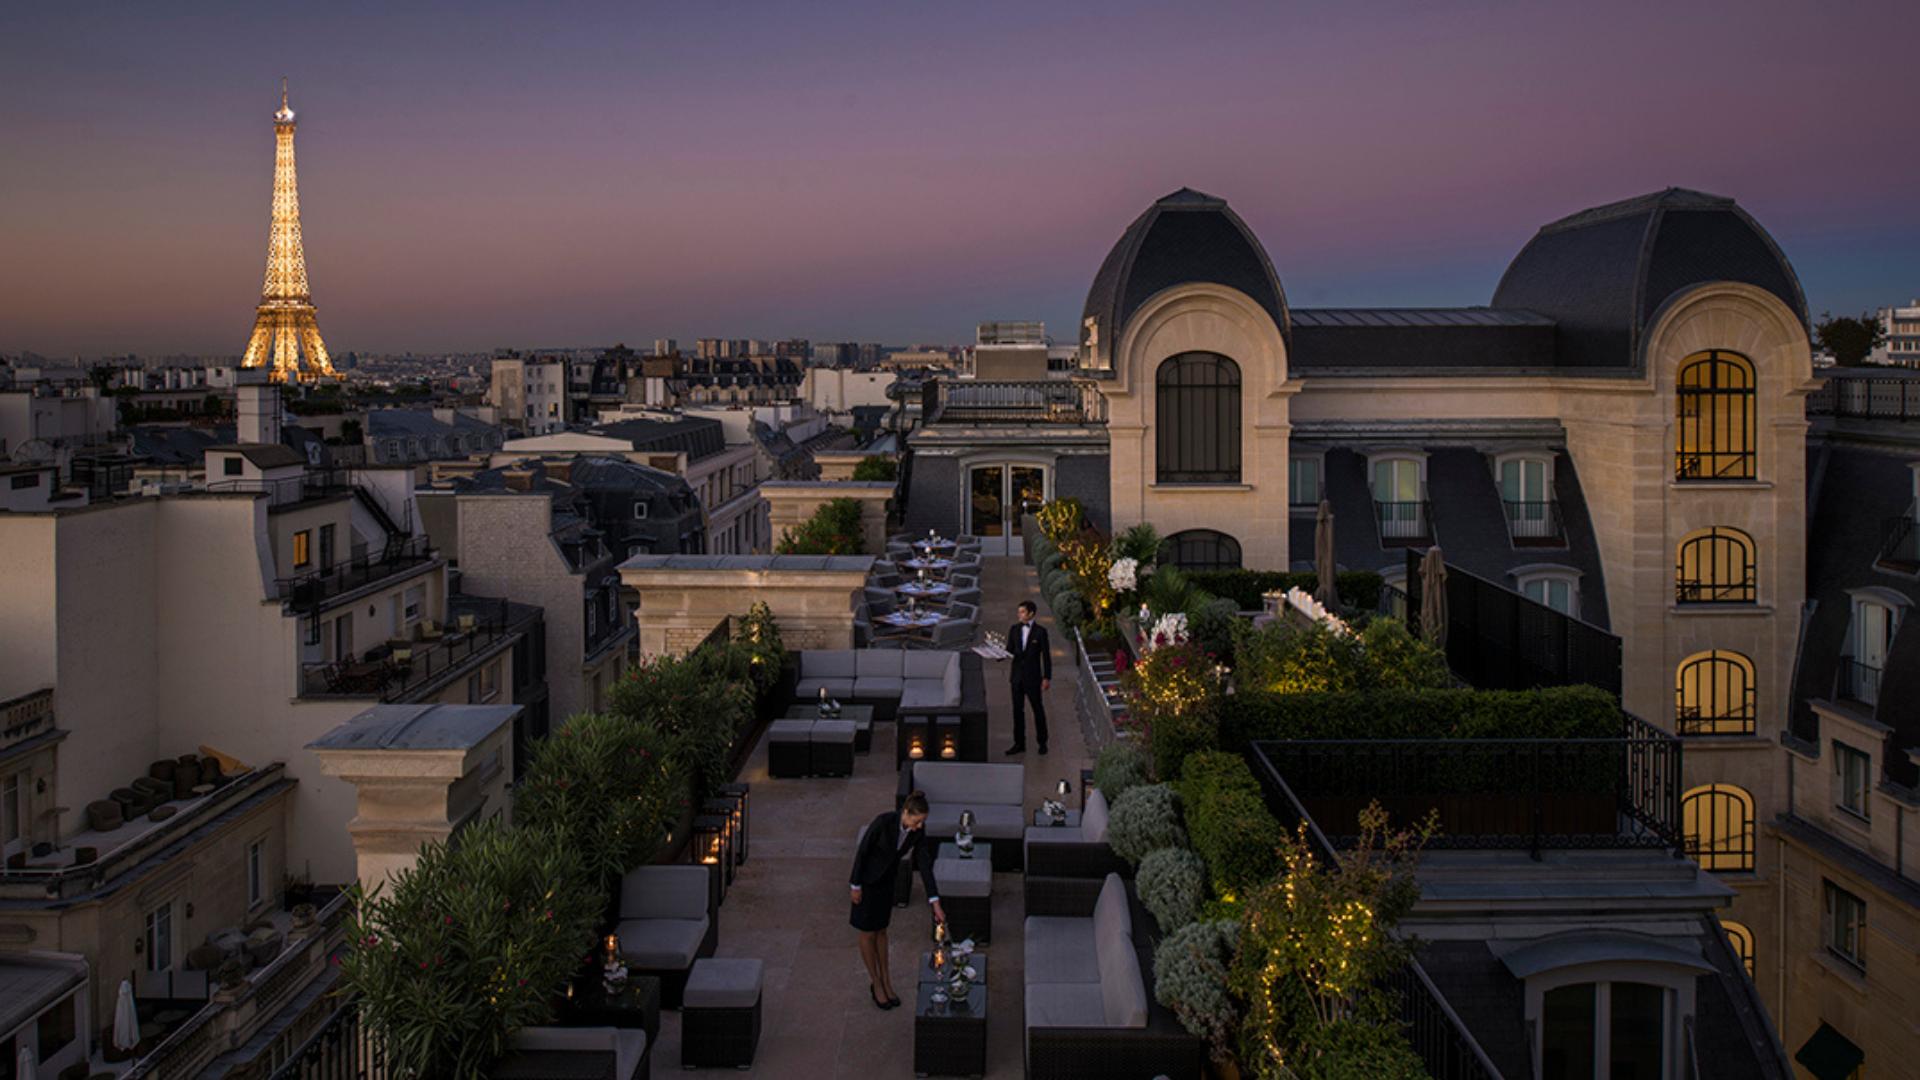 Rooftop Paris